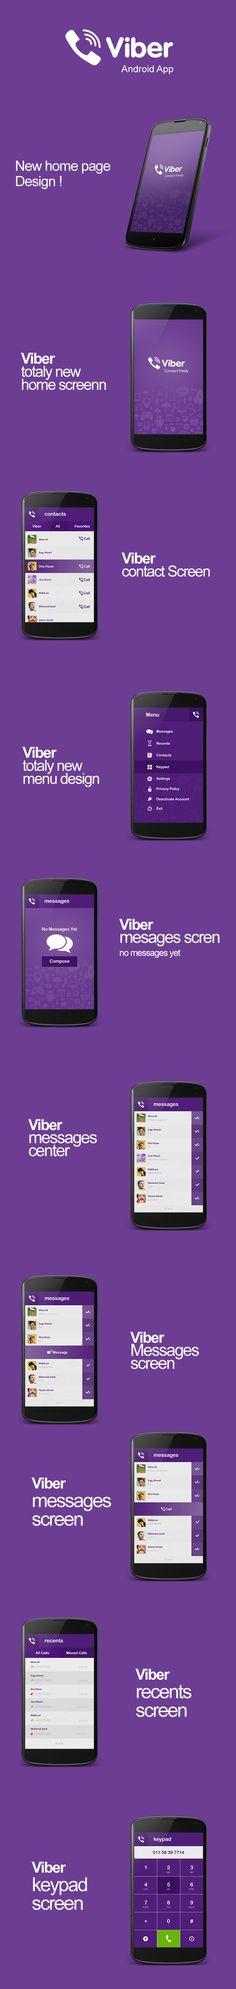 Concept Viber App